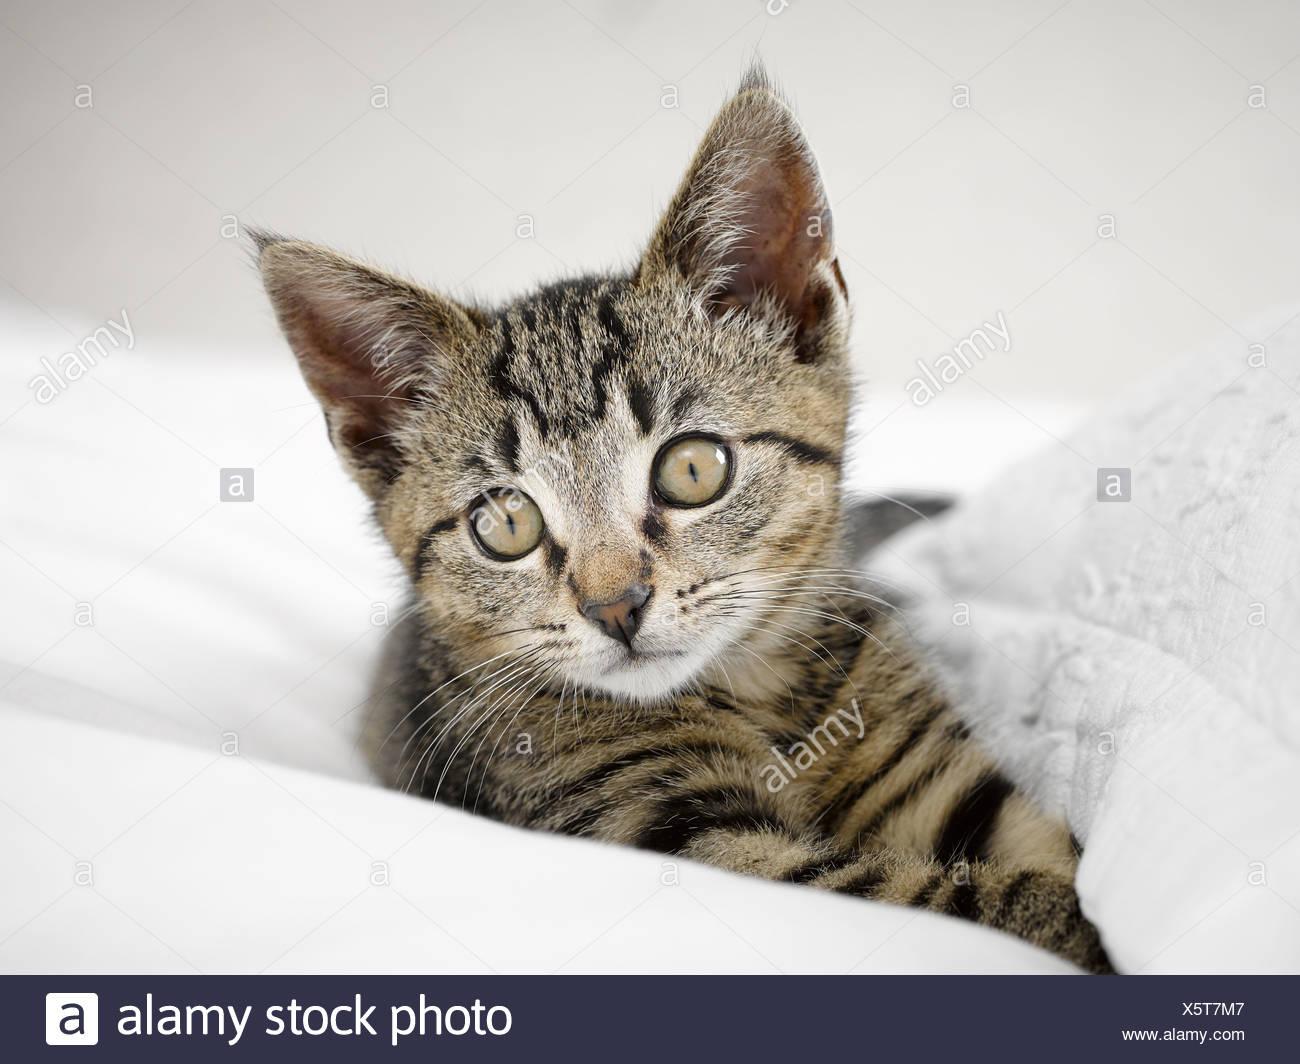 Kitten relaxing in blankets - Stock Image